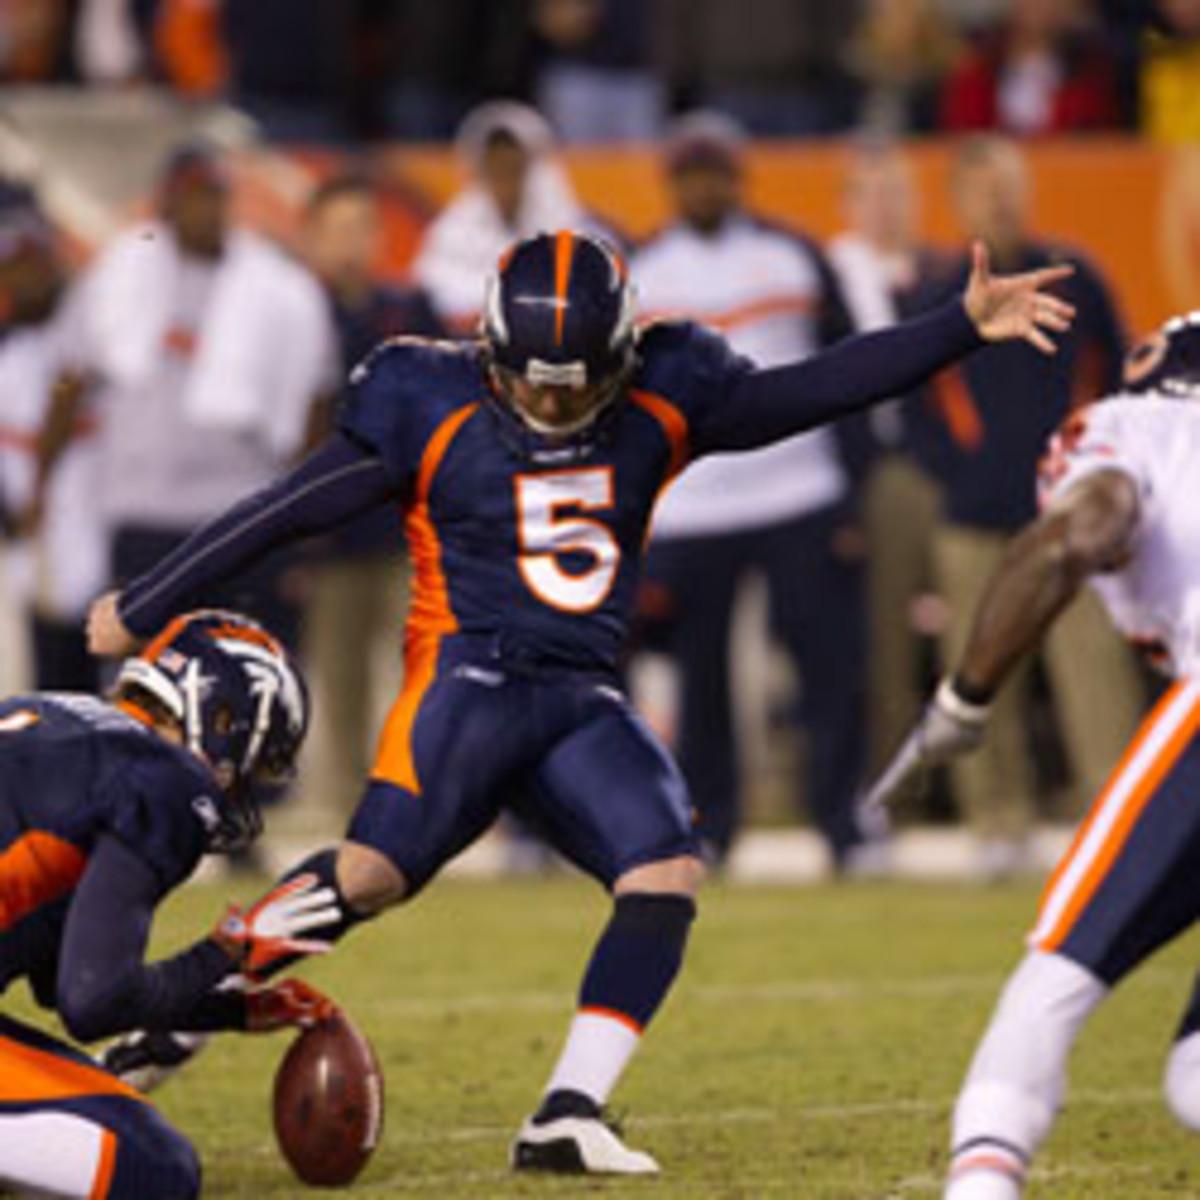 Matt Prater, Denver Broncos